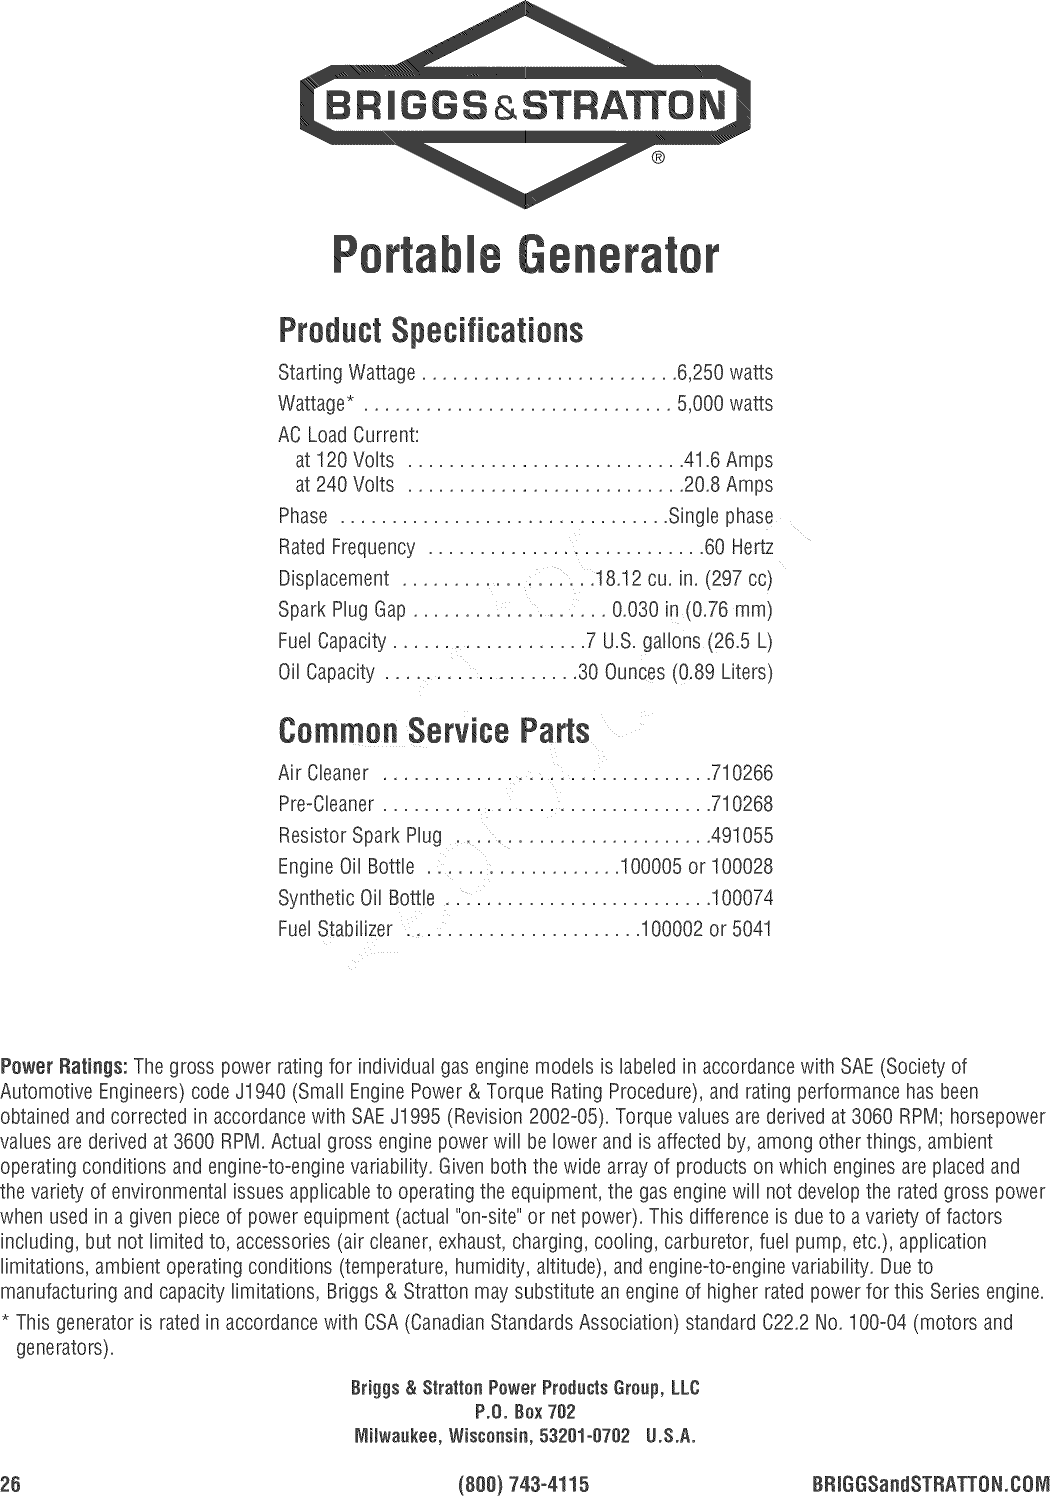 Briggs & Stratton 030422 0 User Manual GENERATOR Manuals And Guides ...